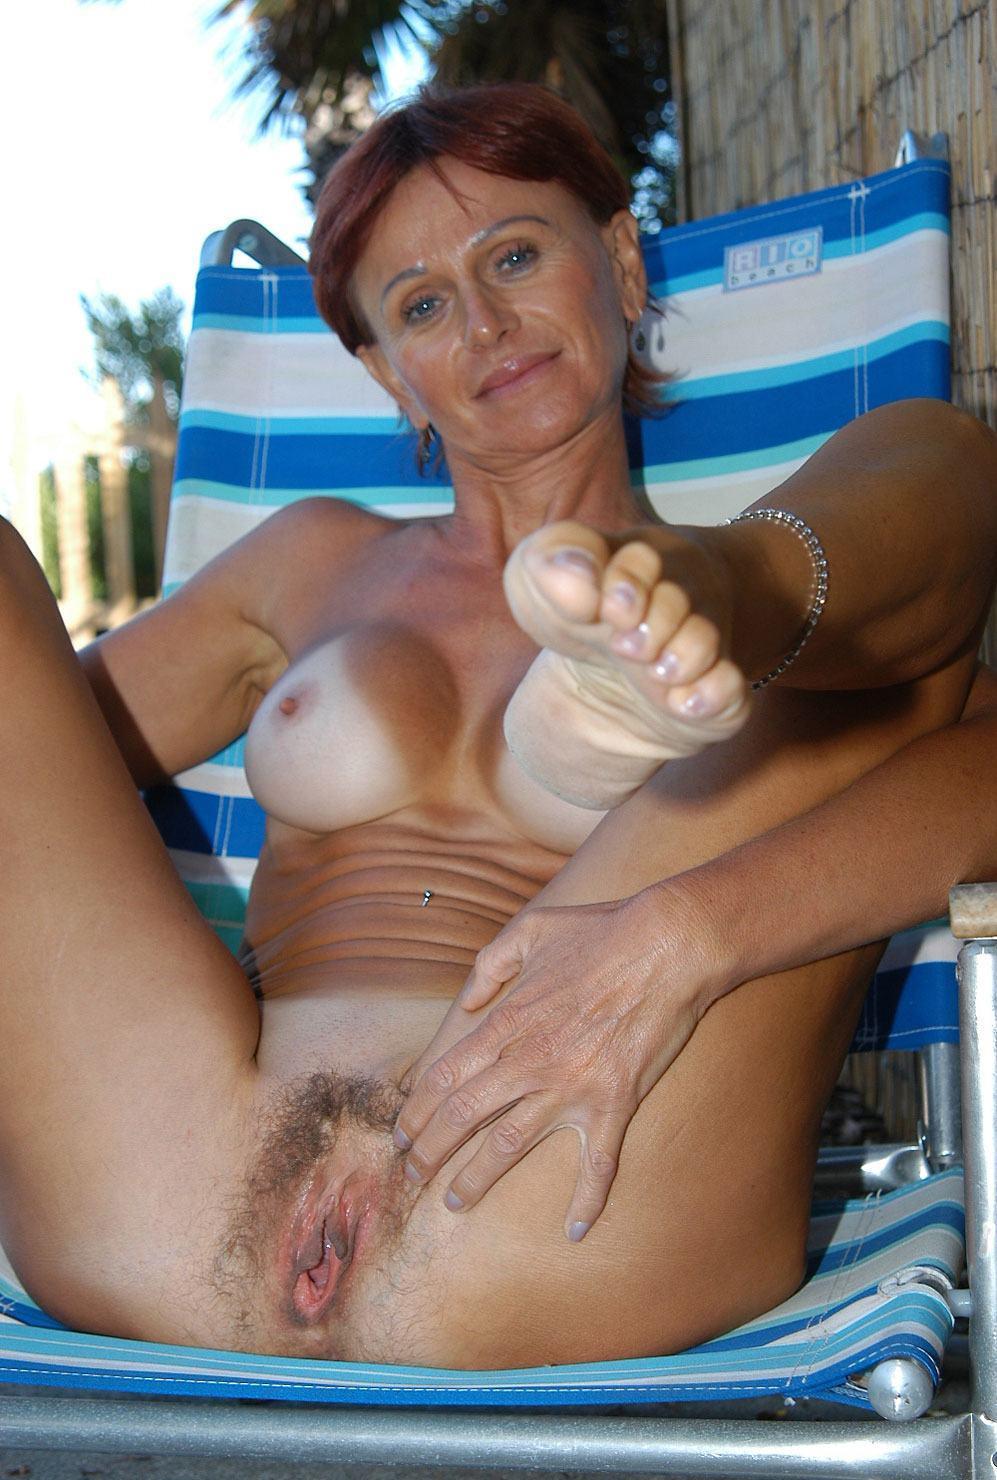 nude women trailer park pussy